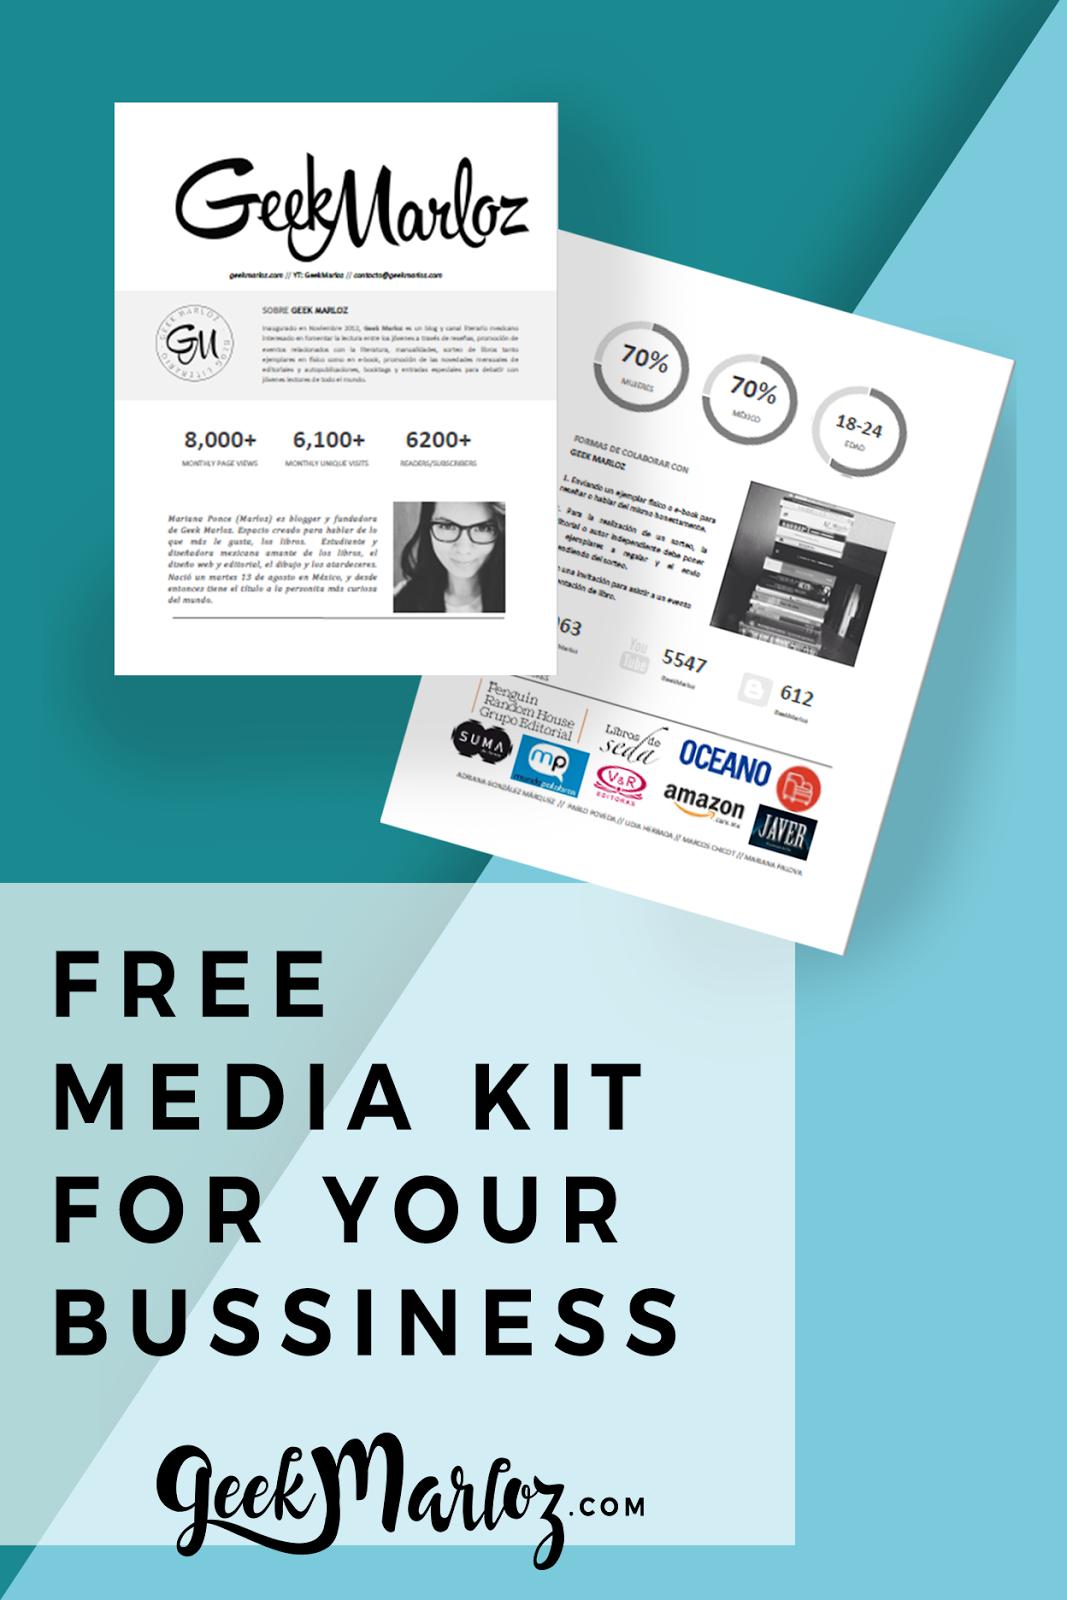 GeekMarloz| Free Media Kit 2017